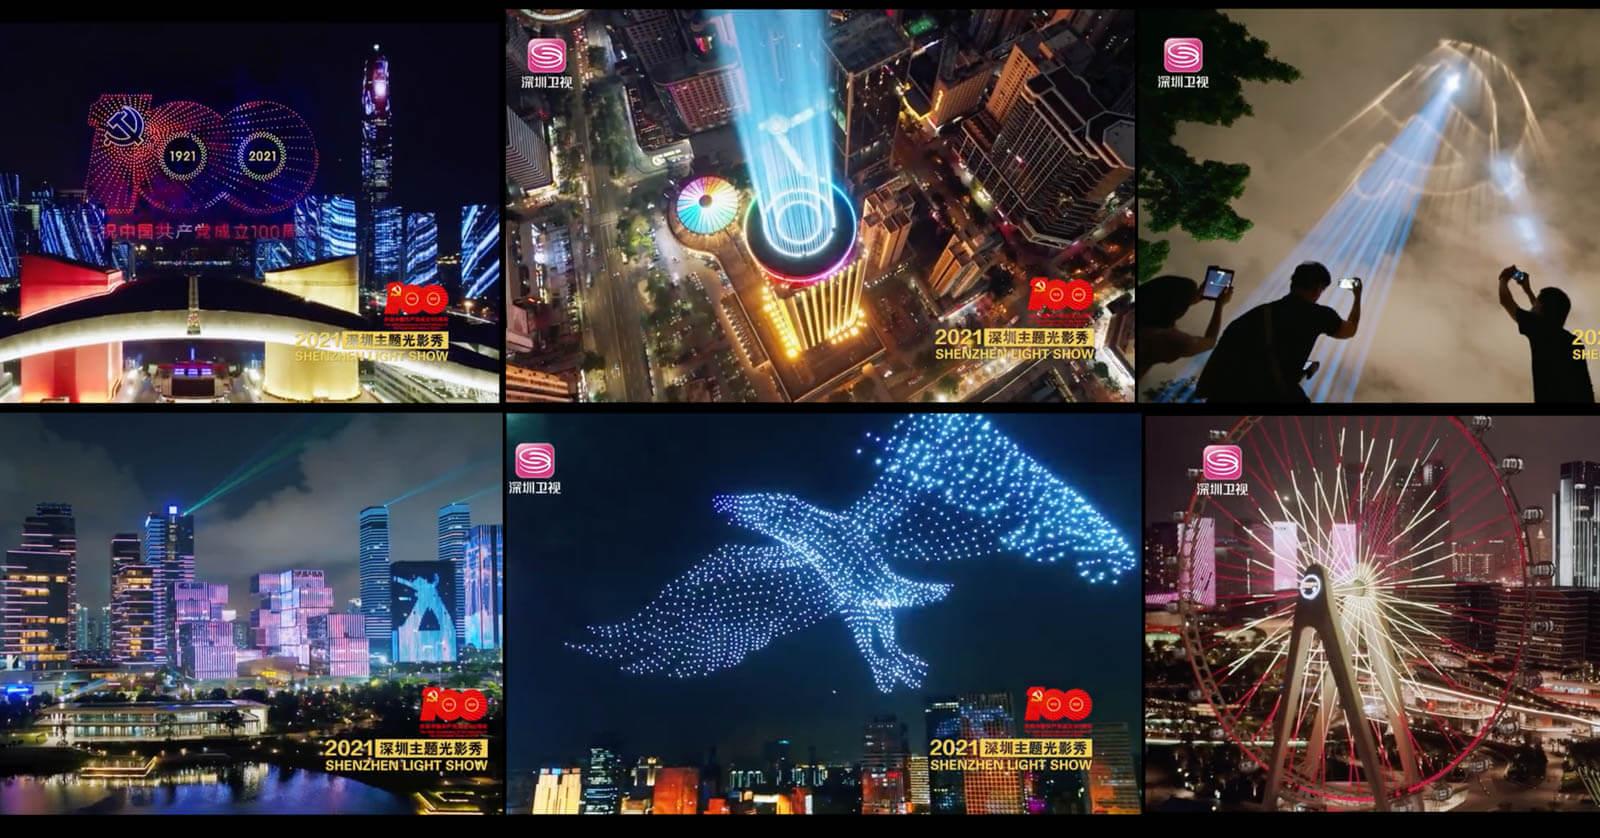 【CCTV】中国共産党100周年記念「SHENZHEN LIGHT SHOW」特別動画公開